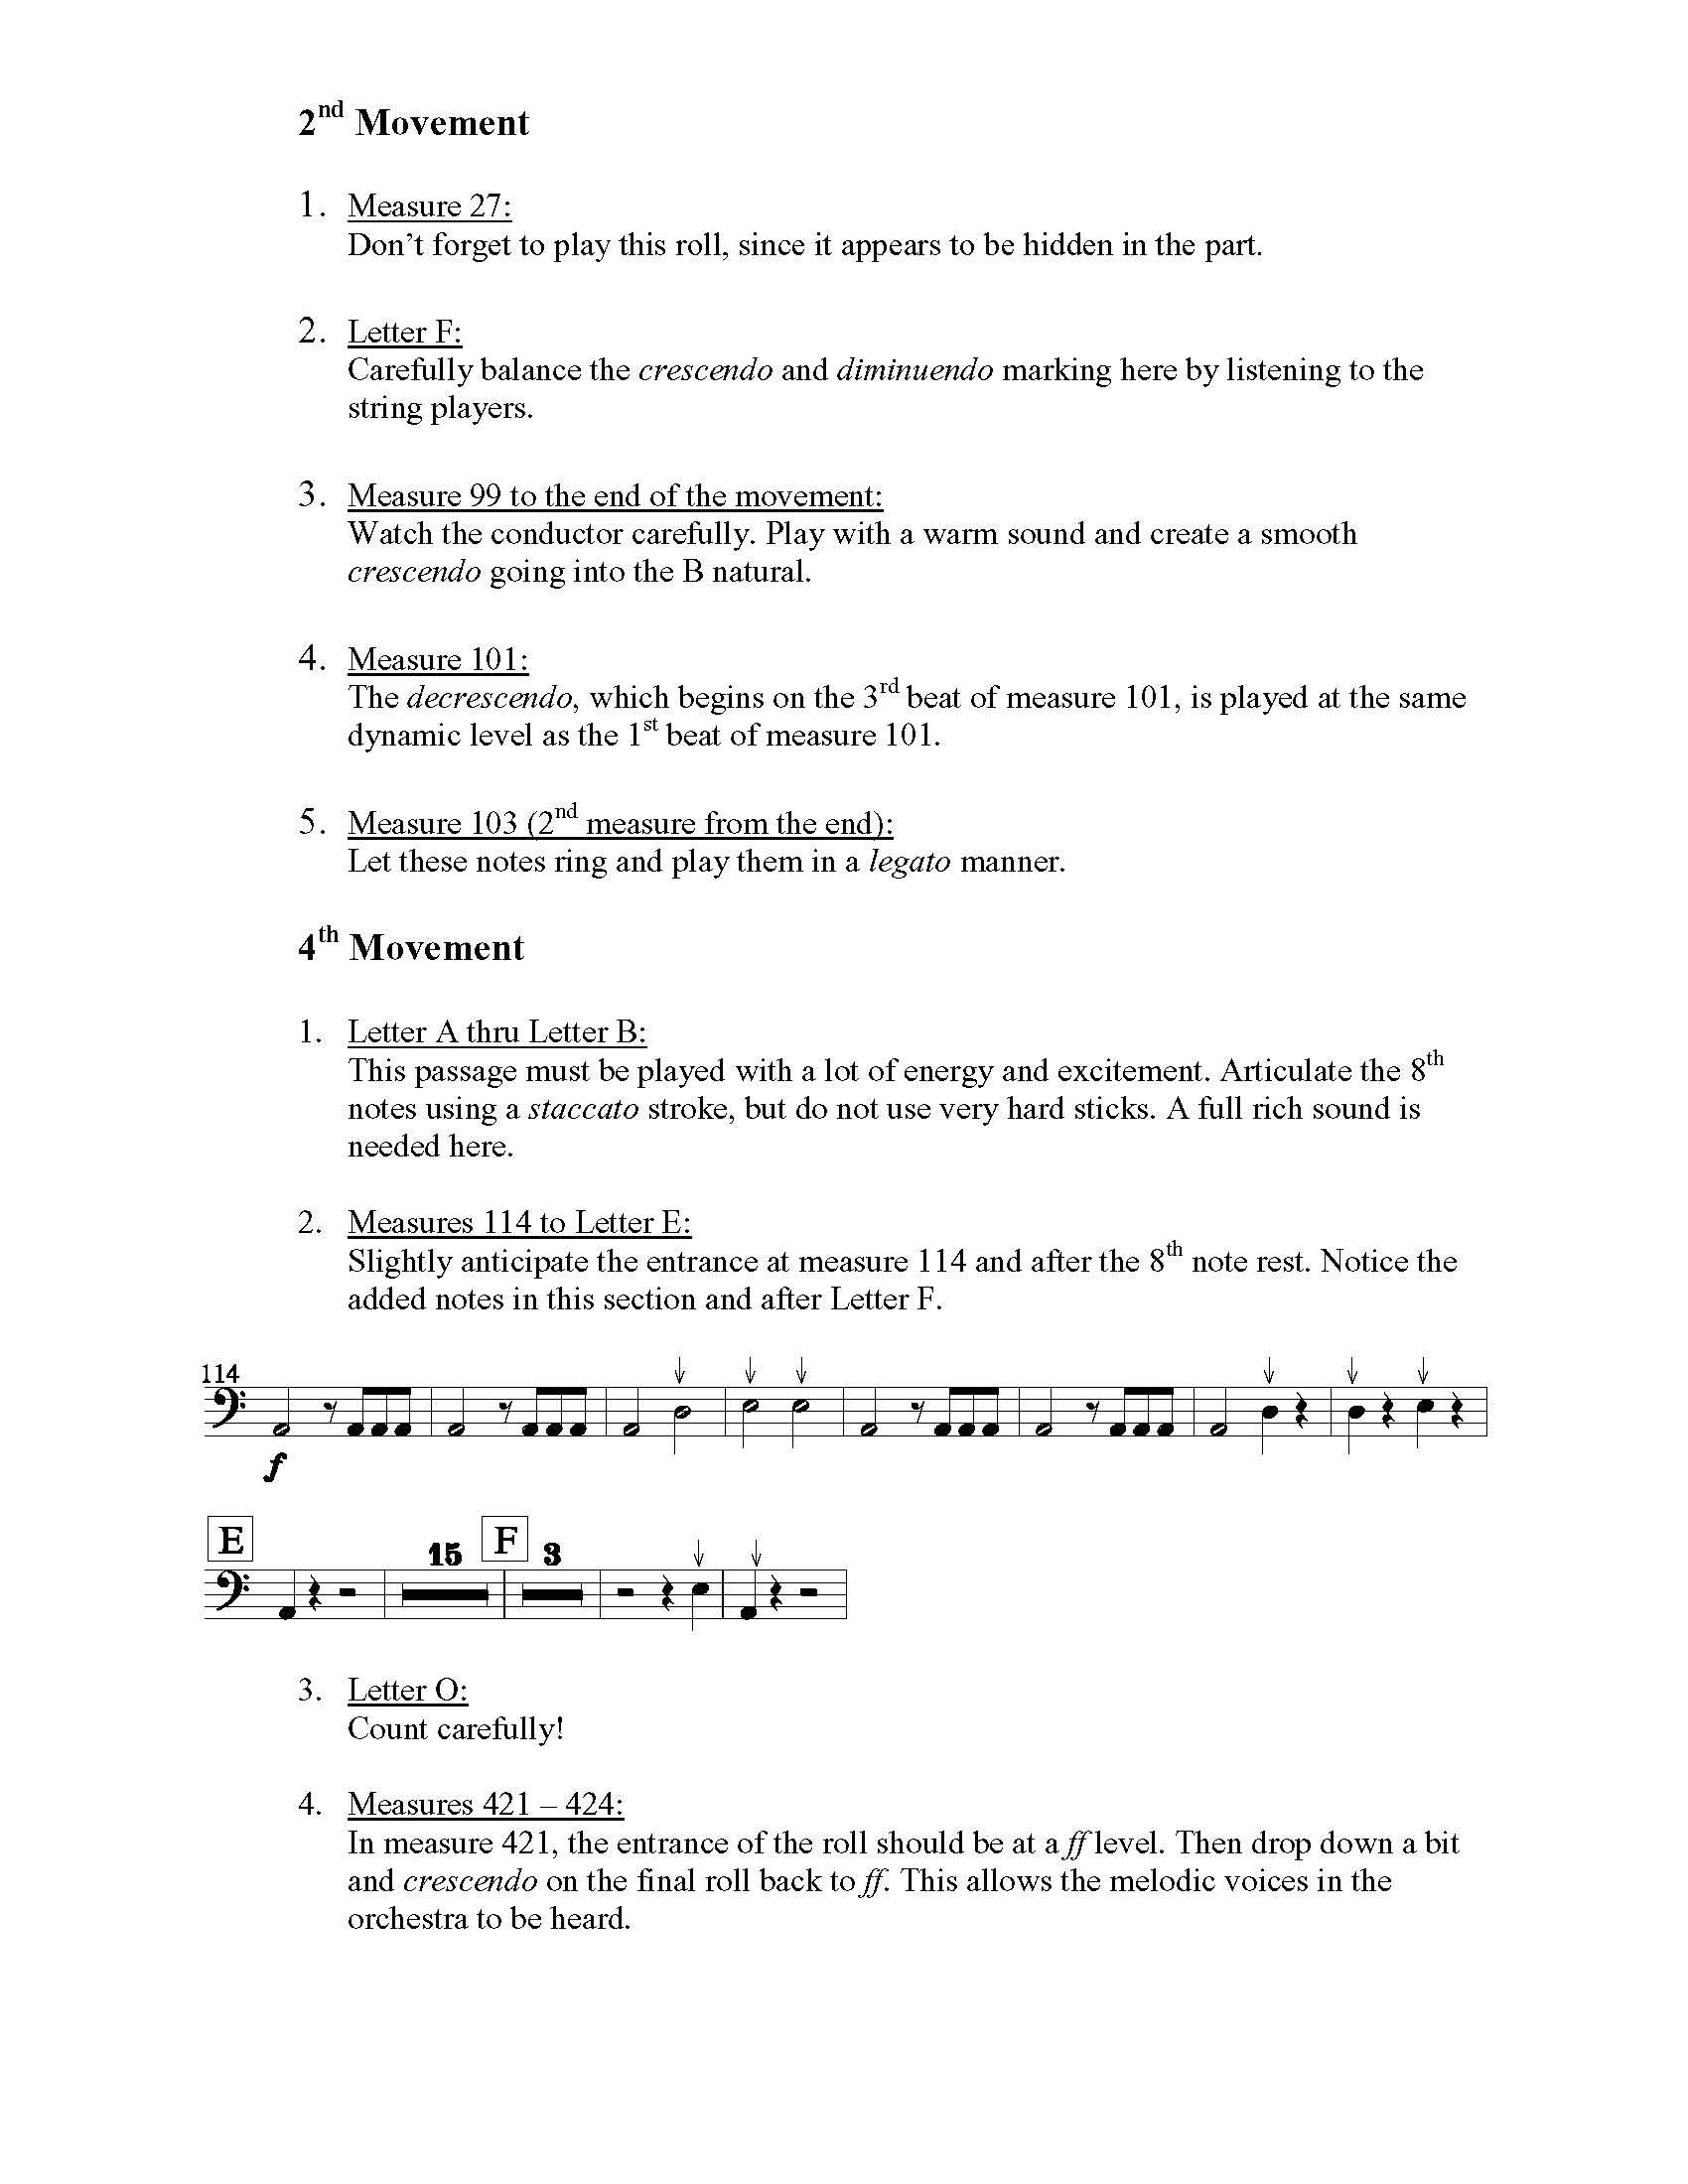 brahms symphony 2 analysis